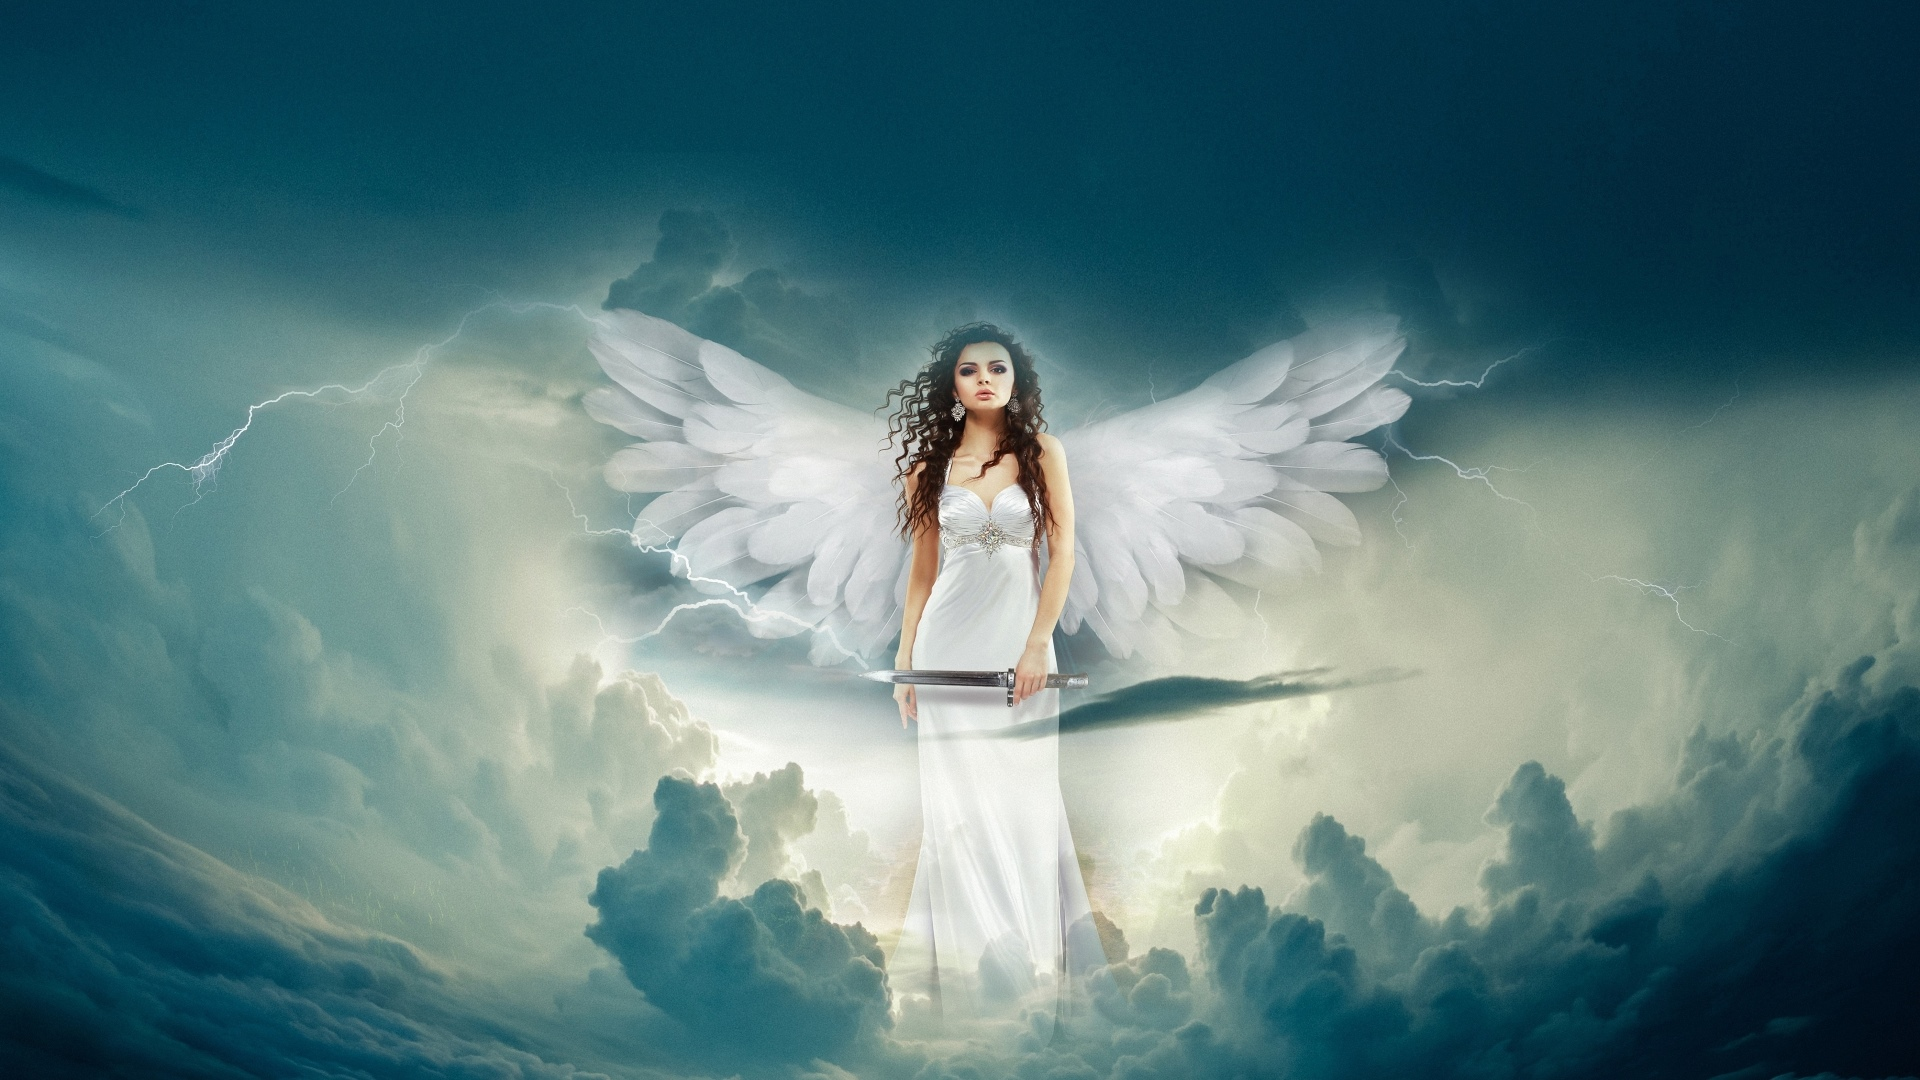 Fantasy bilder engel